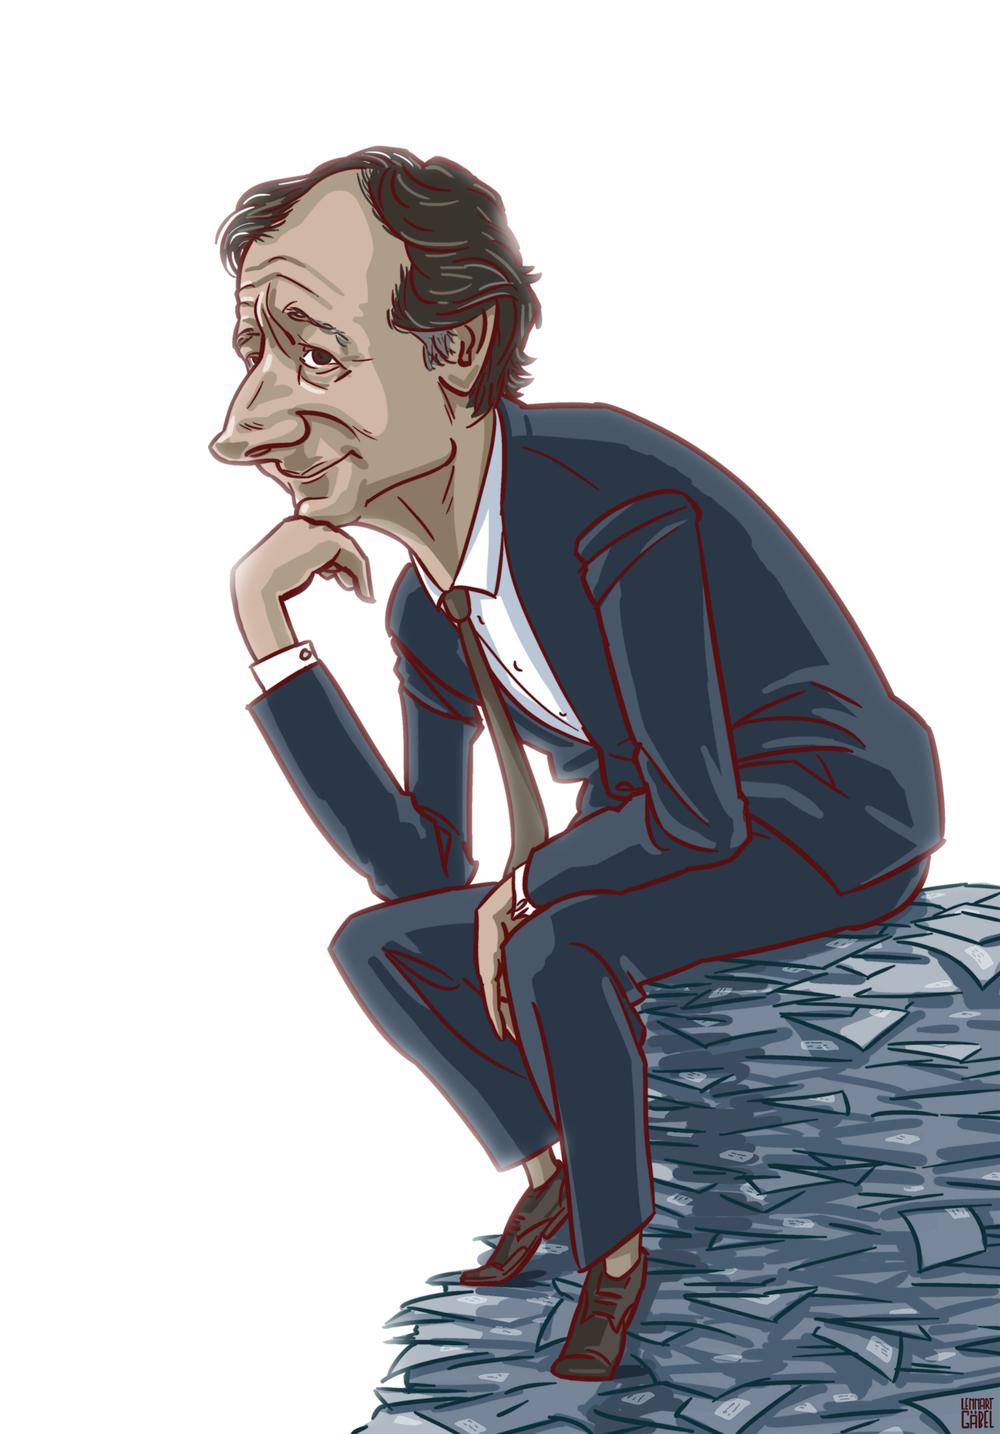 141109_Trouw_Eric_Wiebes_Karikatuur_Lennart_Gaebel_Illustration.jpg